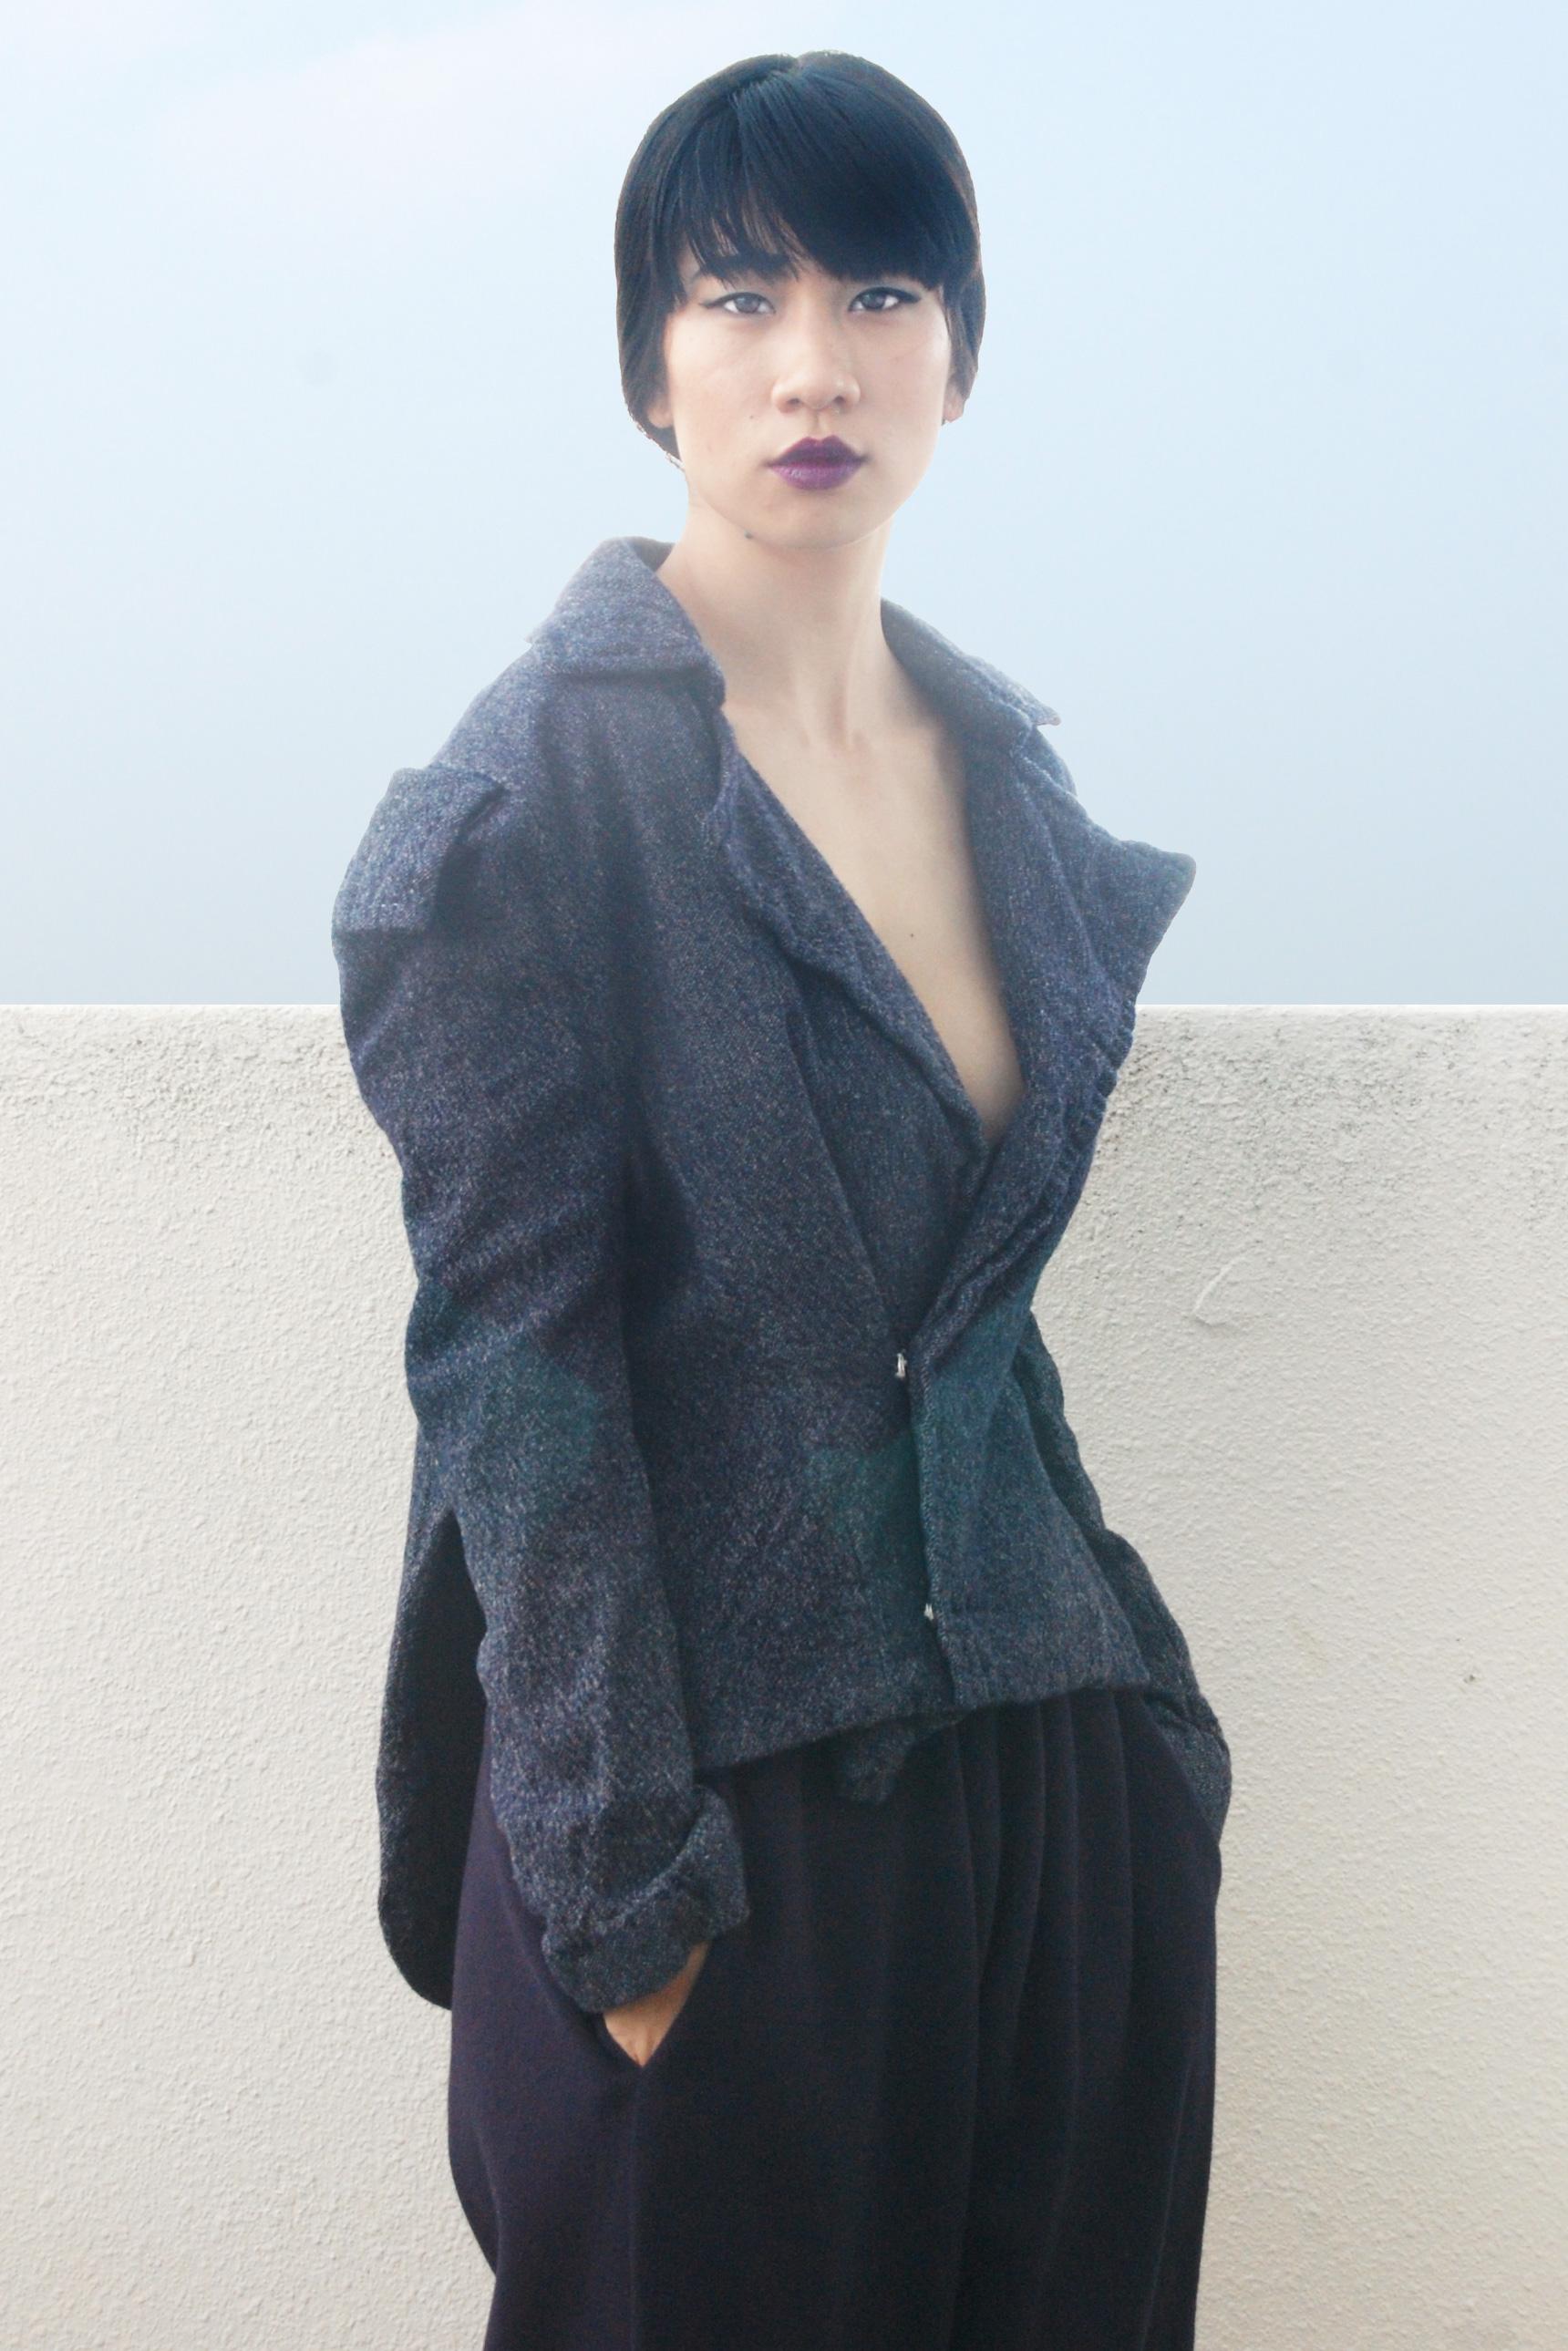 Yohji Yamamoto via The Rosenrot | For The Love of Avant-Garde Fashion